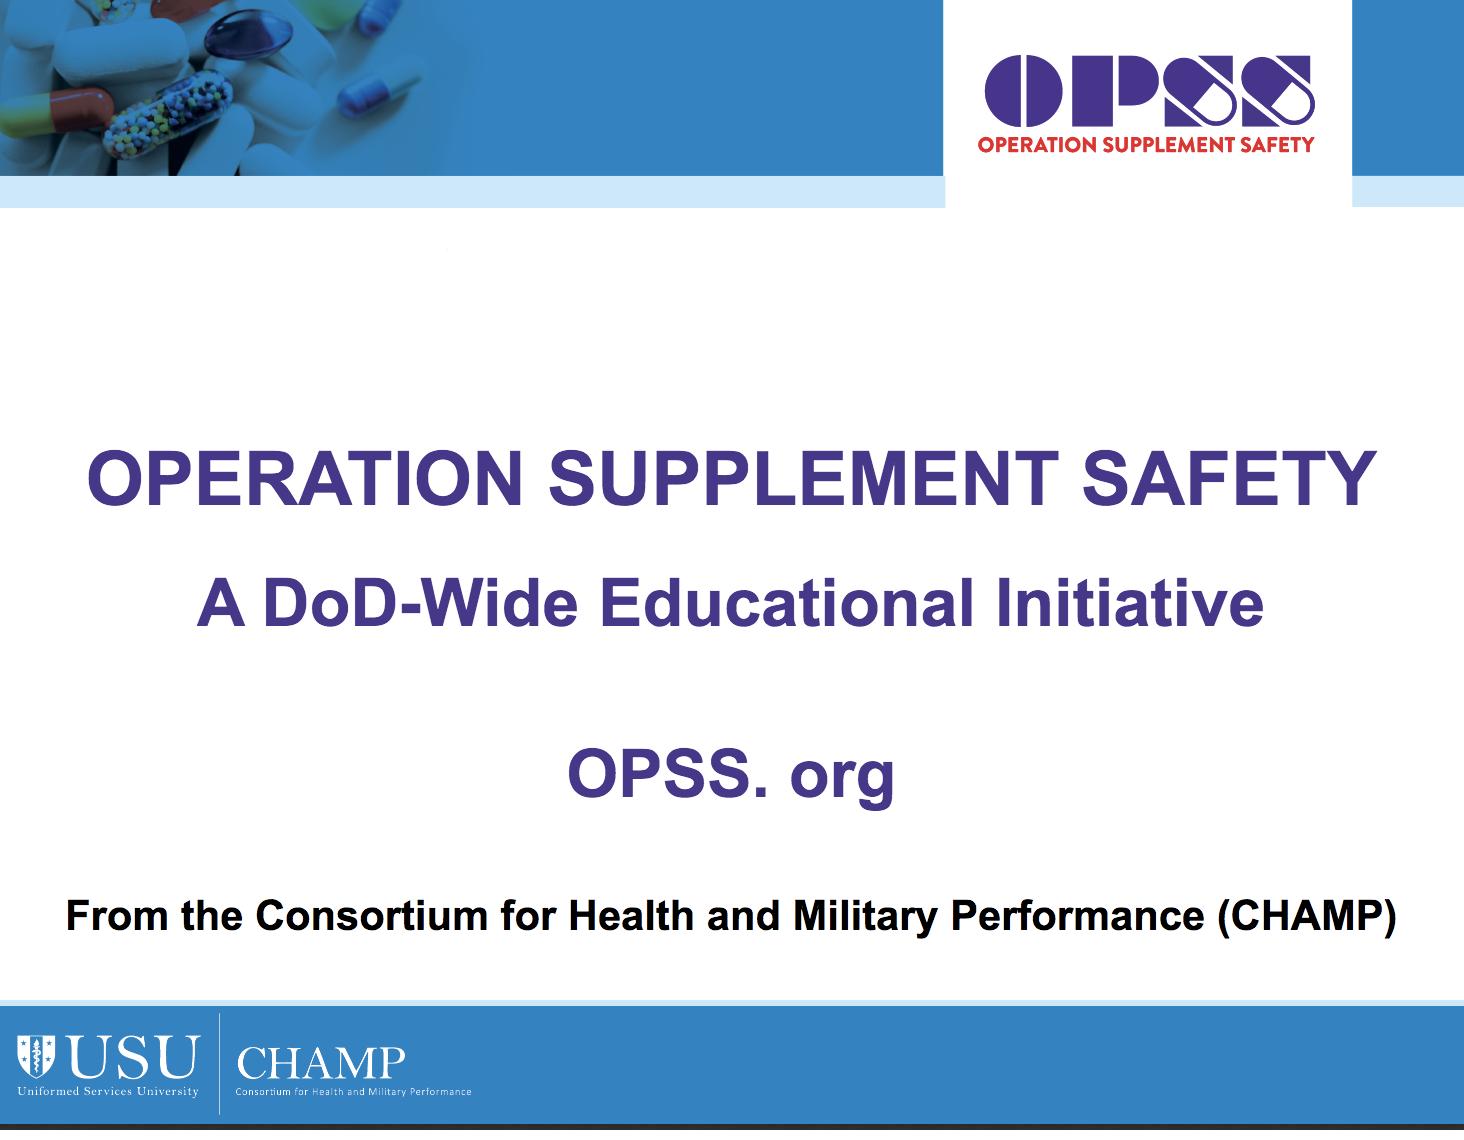 OPSS short presentation slides for providers & leaders